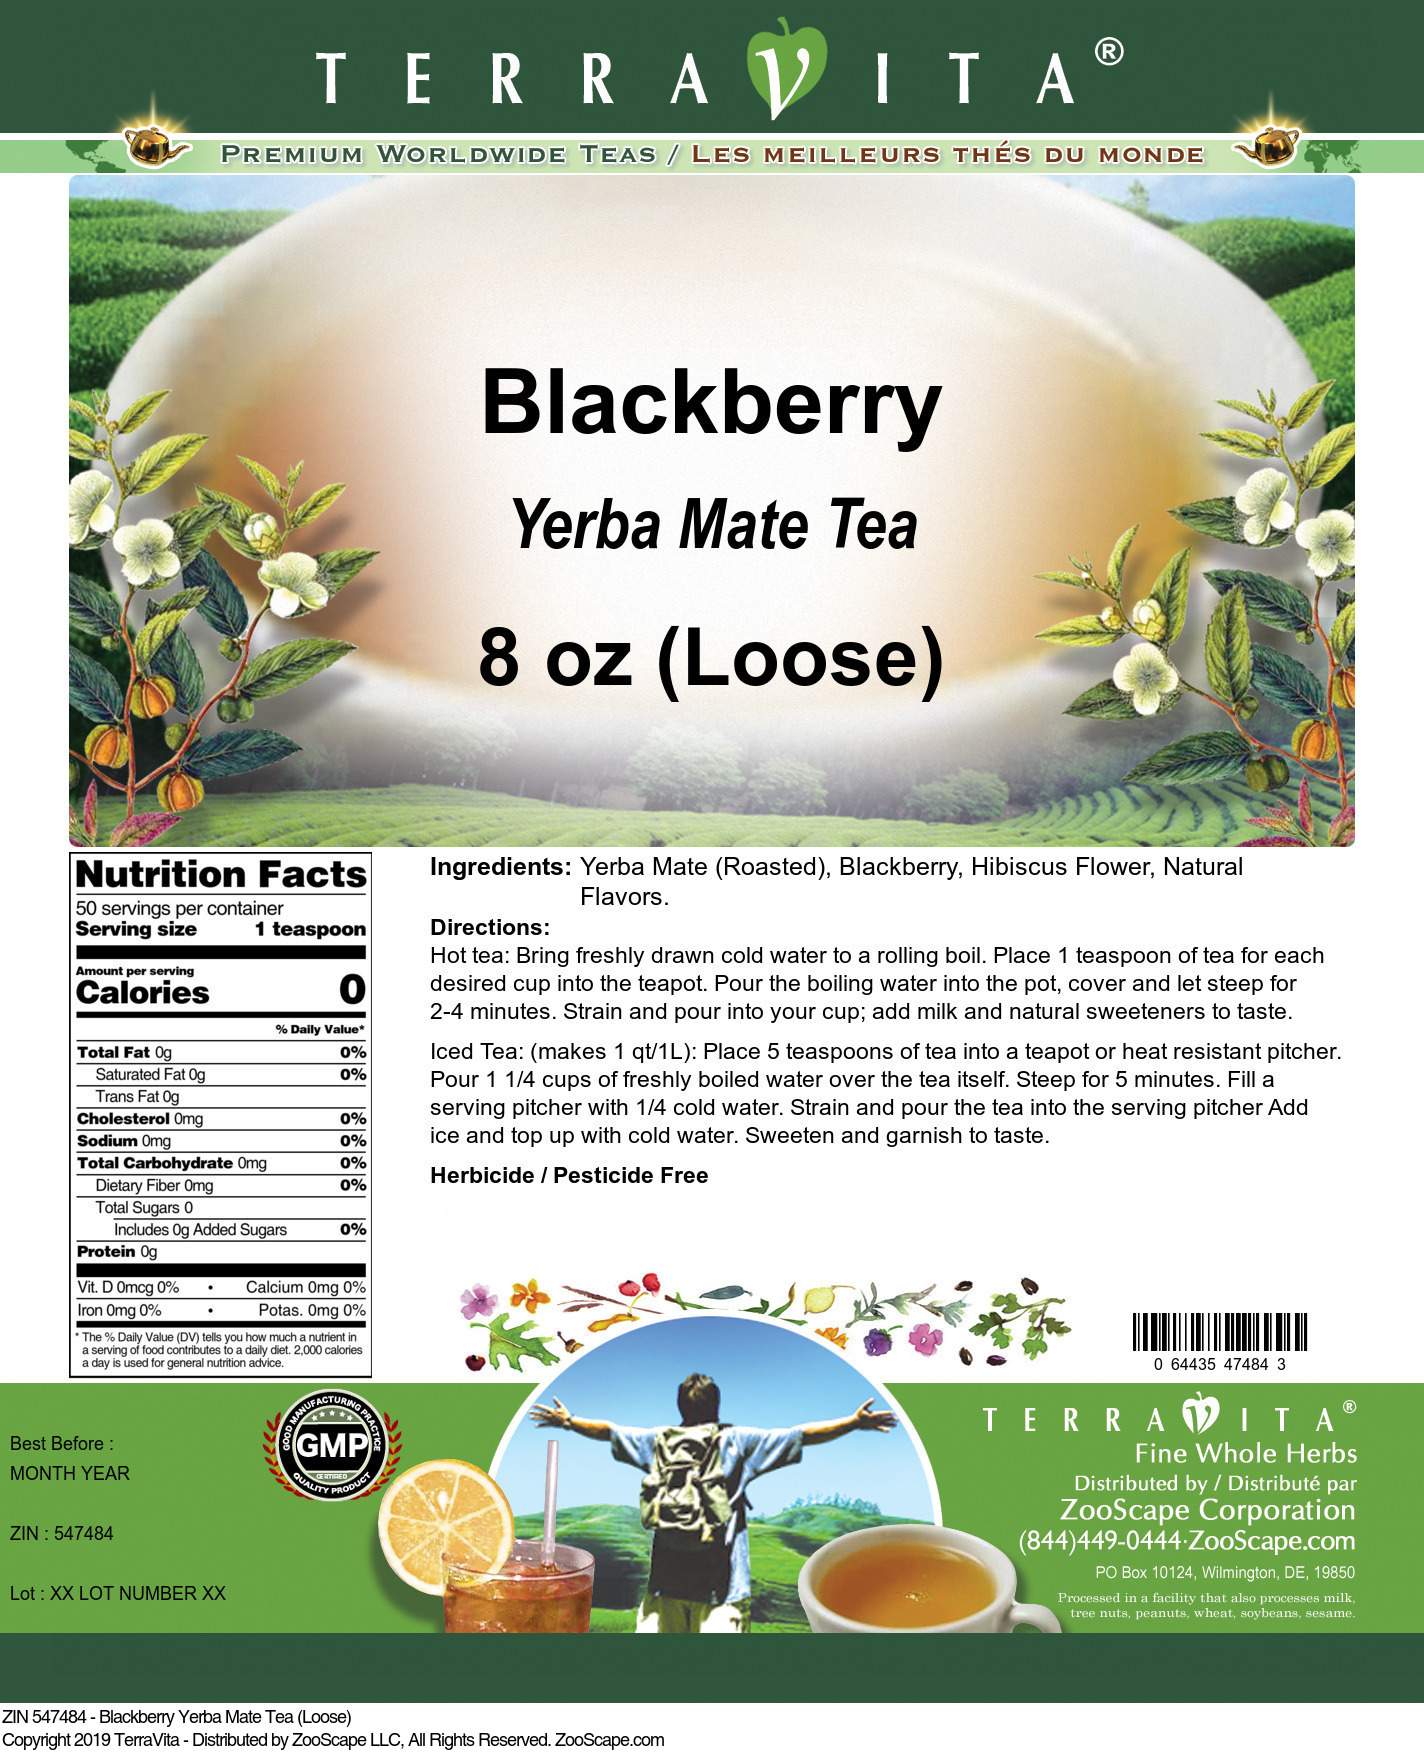 Blackberry Yerba Mate